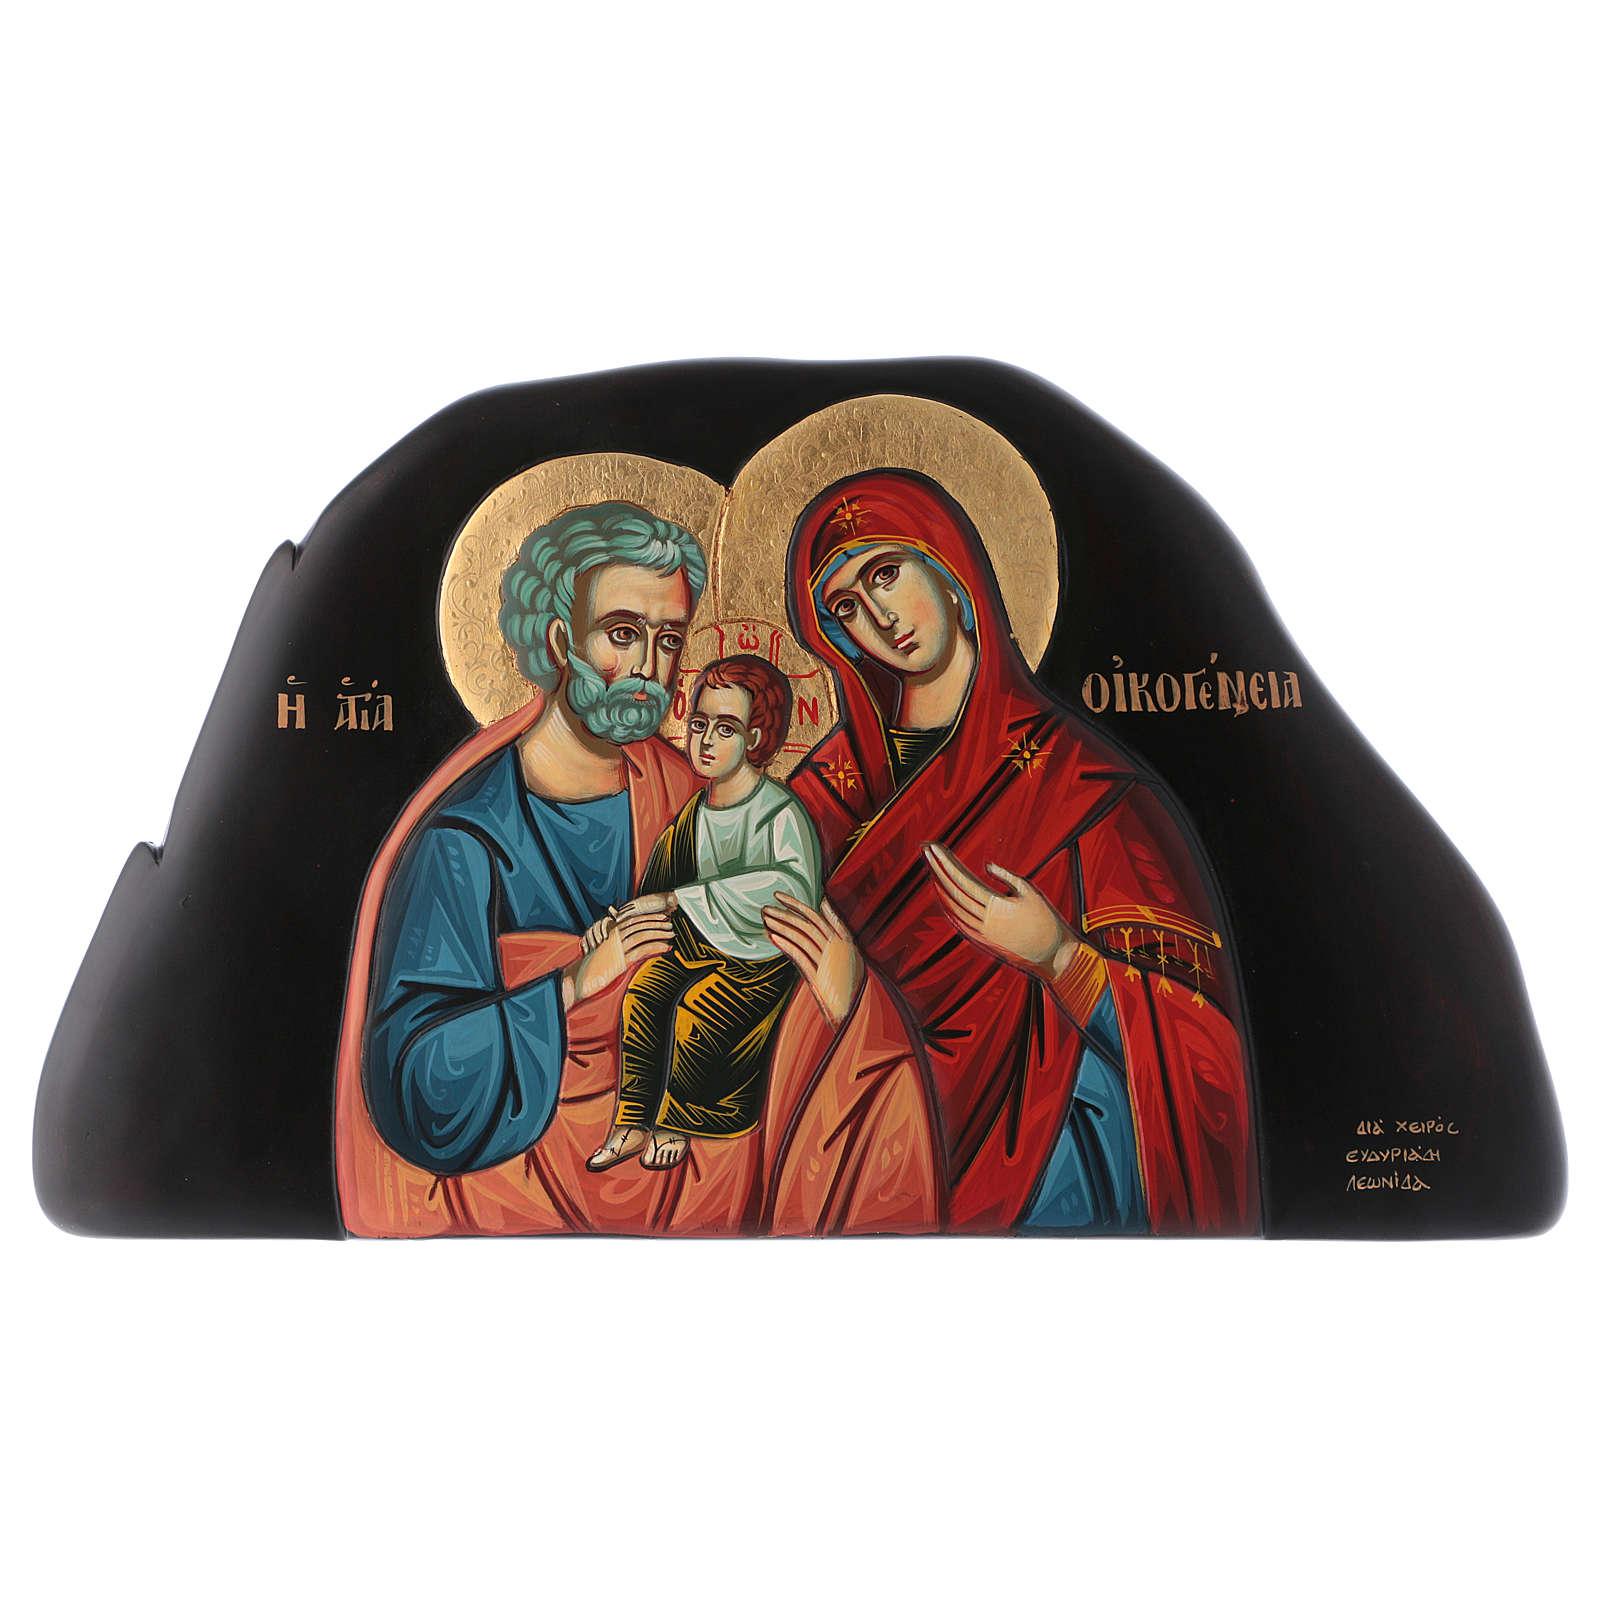 Icona bassorilievo Sacra Famiglia stile bizantino 25x45 cm 4